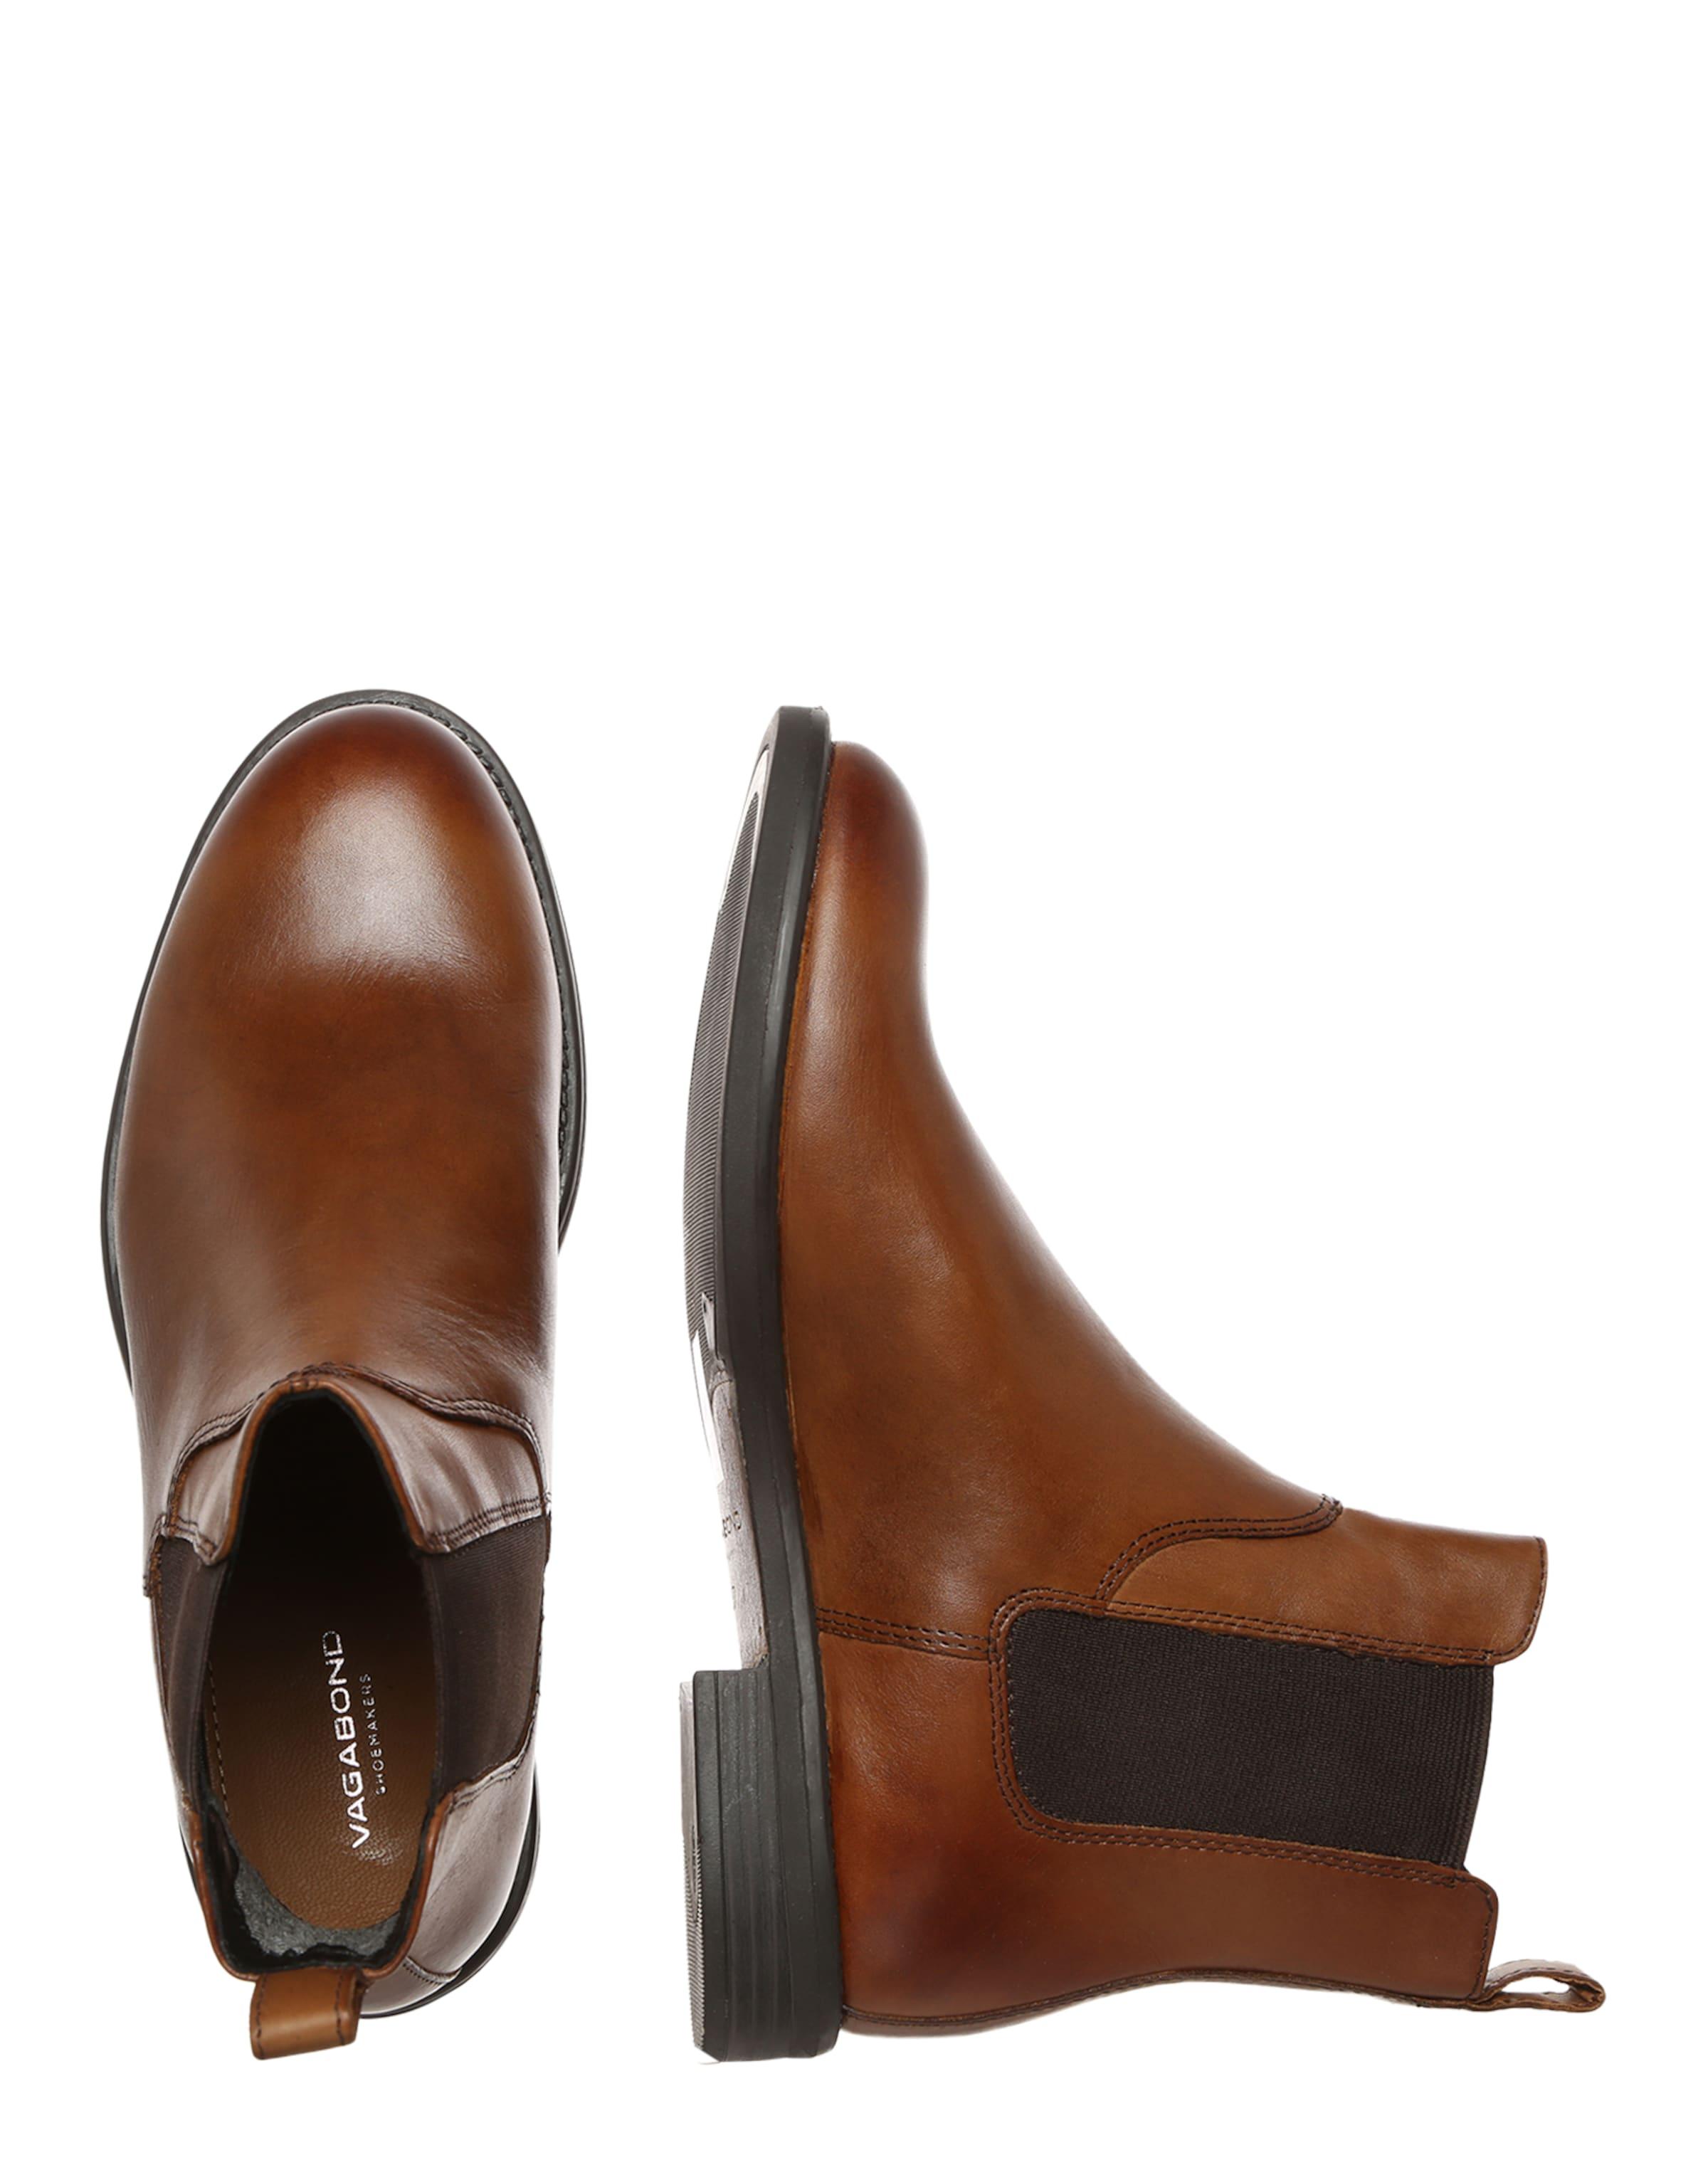 En Vagabond Shoemakers Boots Cognac Chelsea 'amina' rQCxBEdoeW